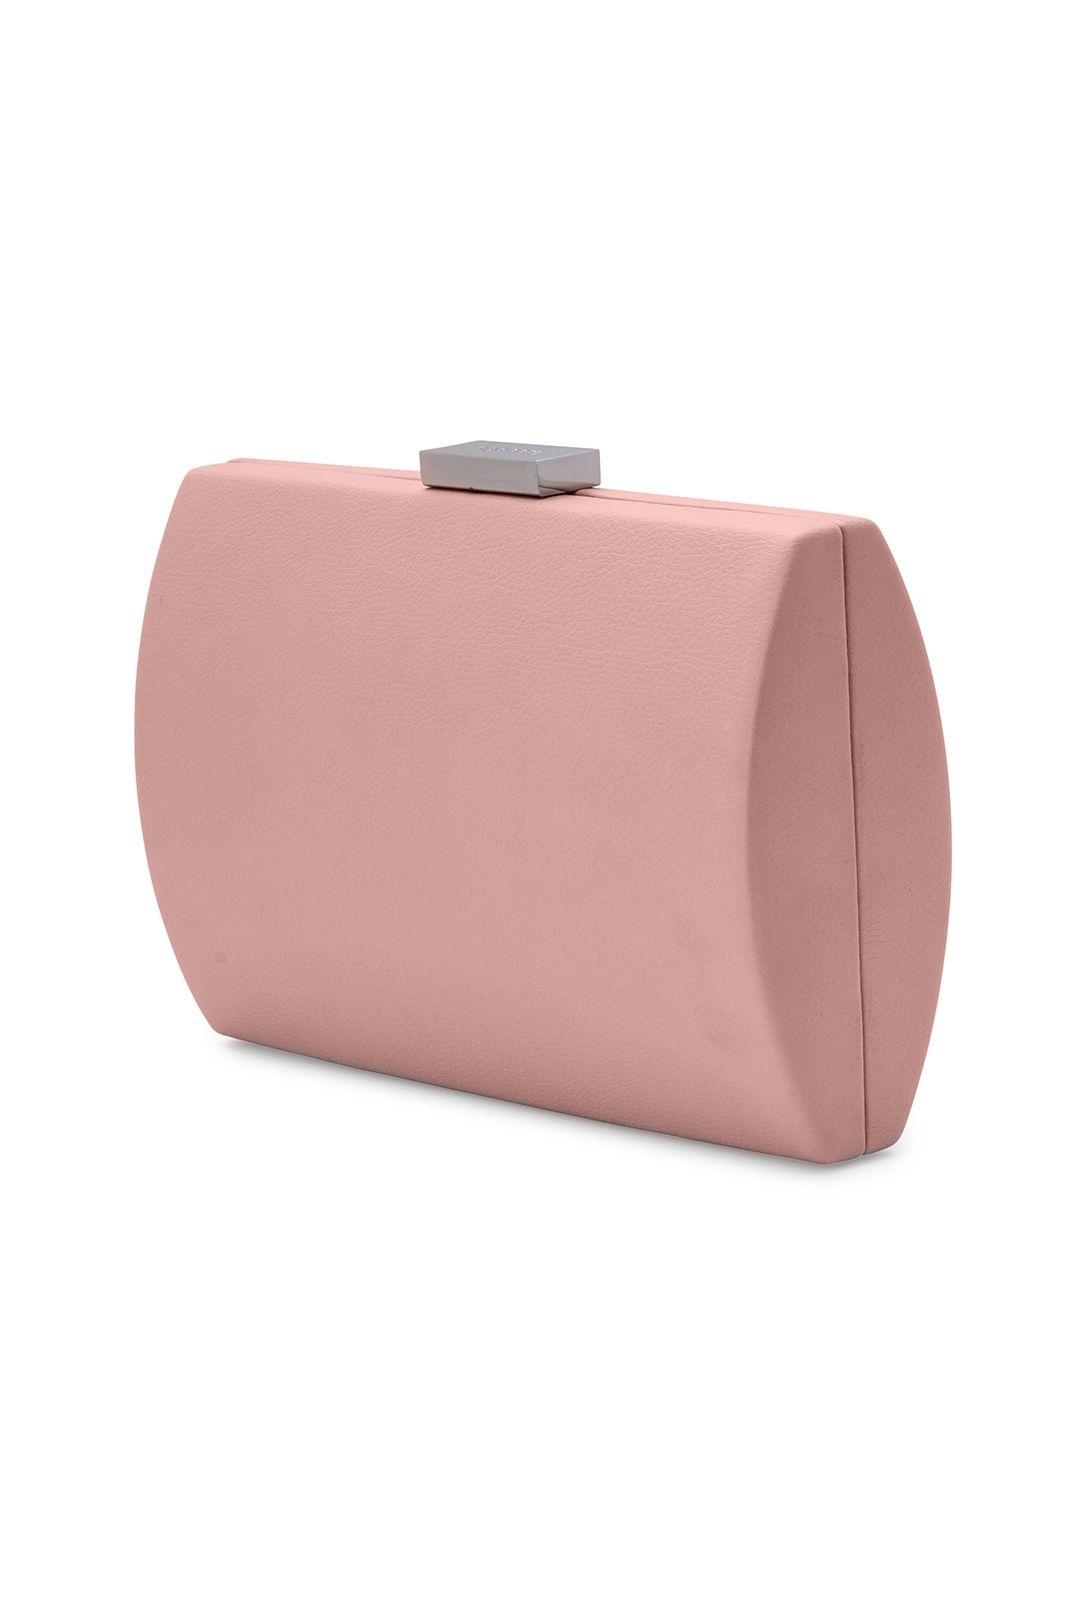 Olga Berg - Adley Oversized Pod - Pale Pink - Side